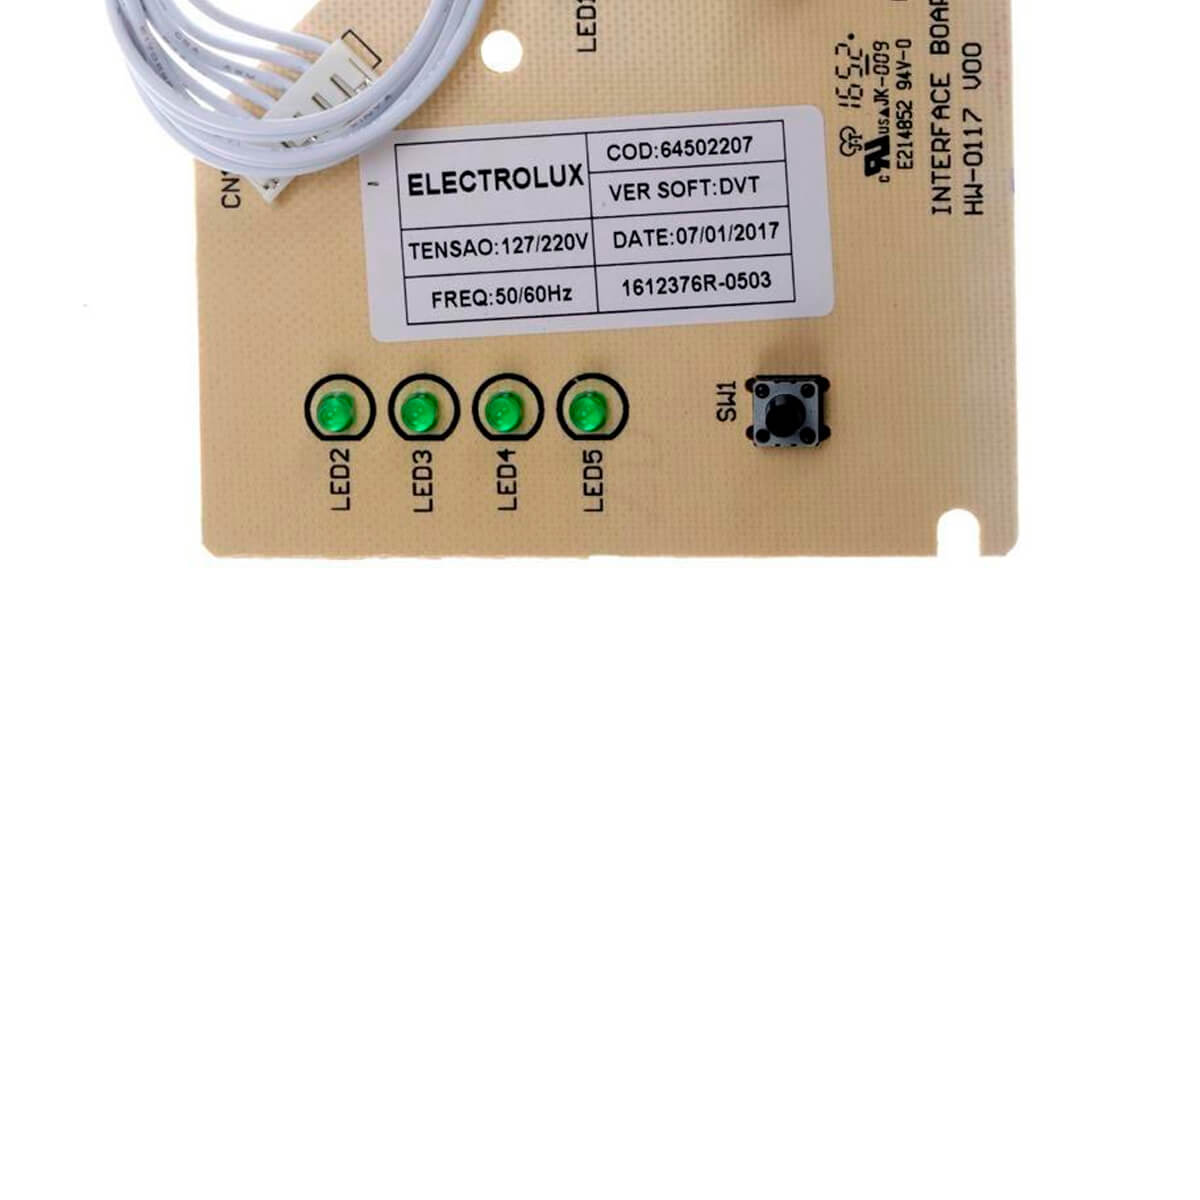 Placa De Interface Para Lavadora De Roupas Electrolux LTE12 - 64502207